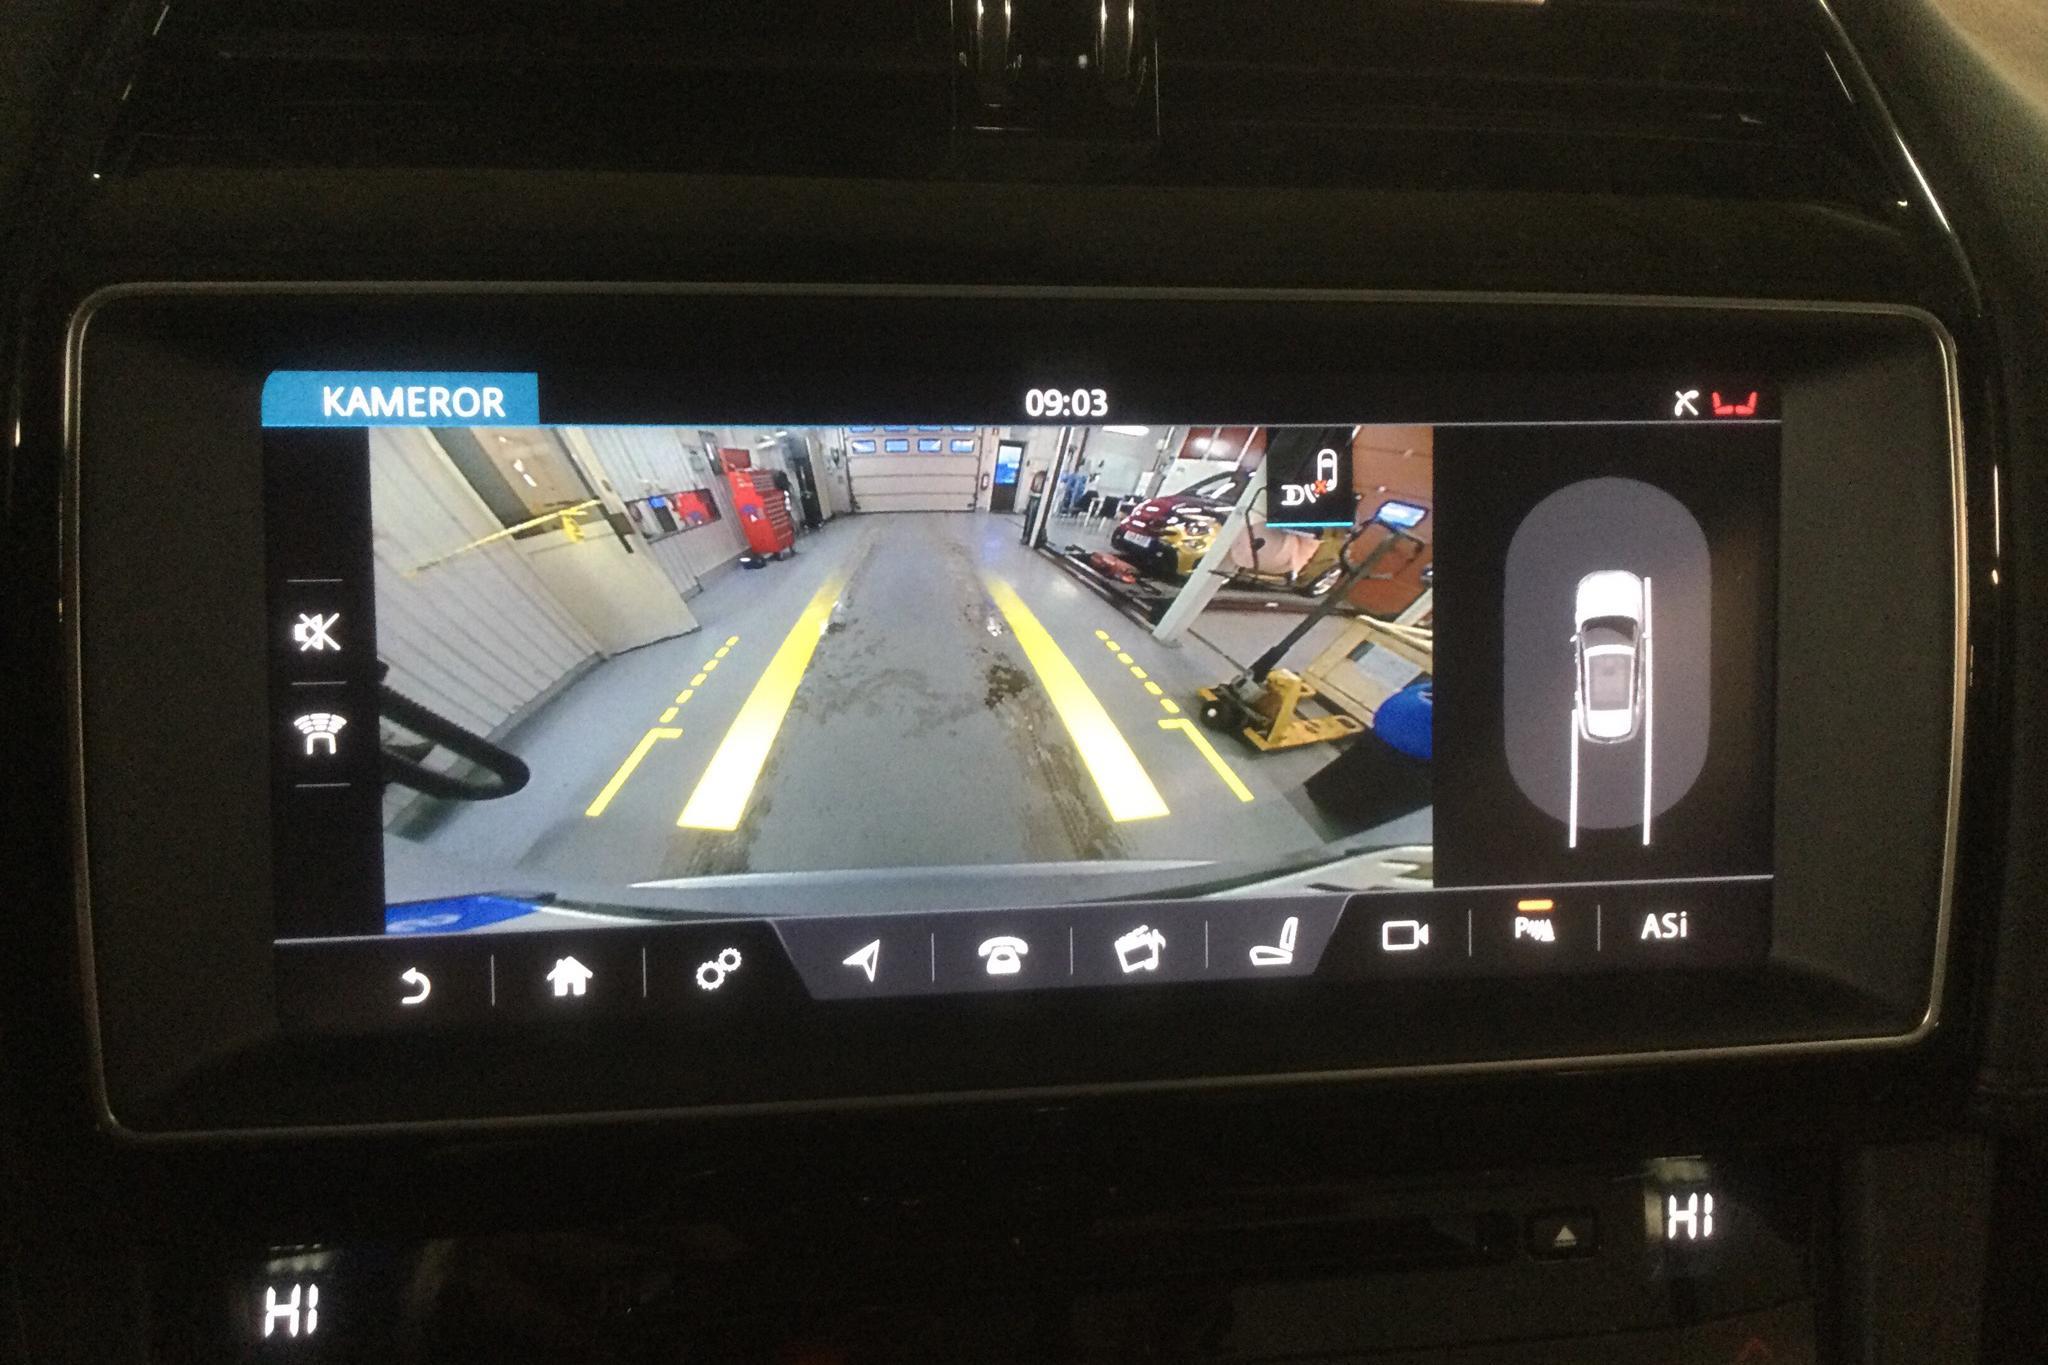 Jaguar F-Pace 3.0 V6 AWD (380hk) - 5 232 mil - Automat - grå - 2017